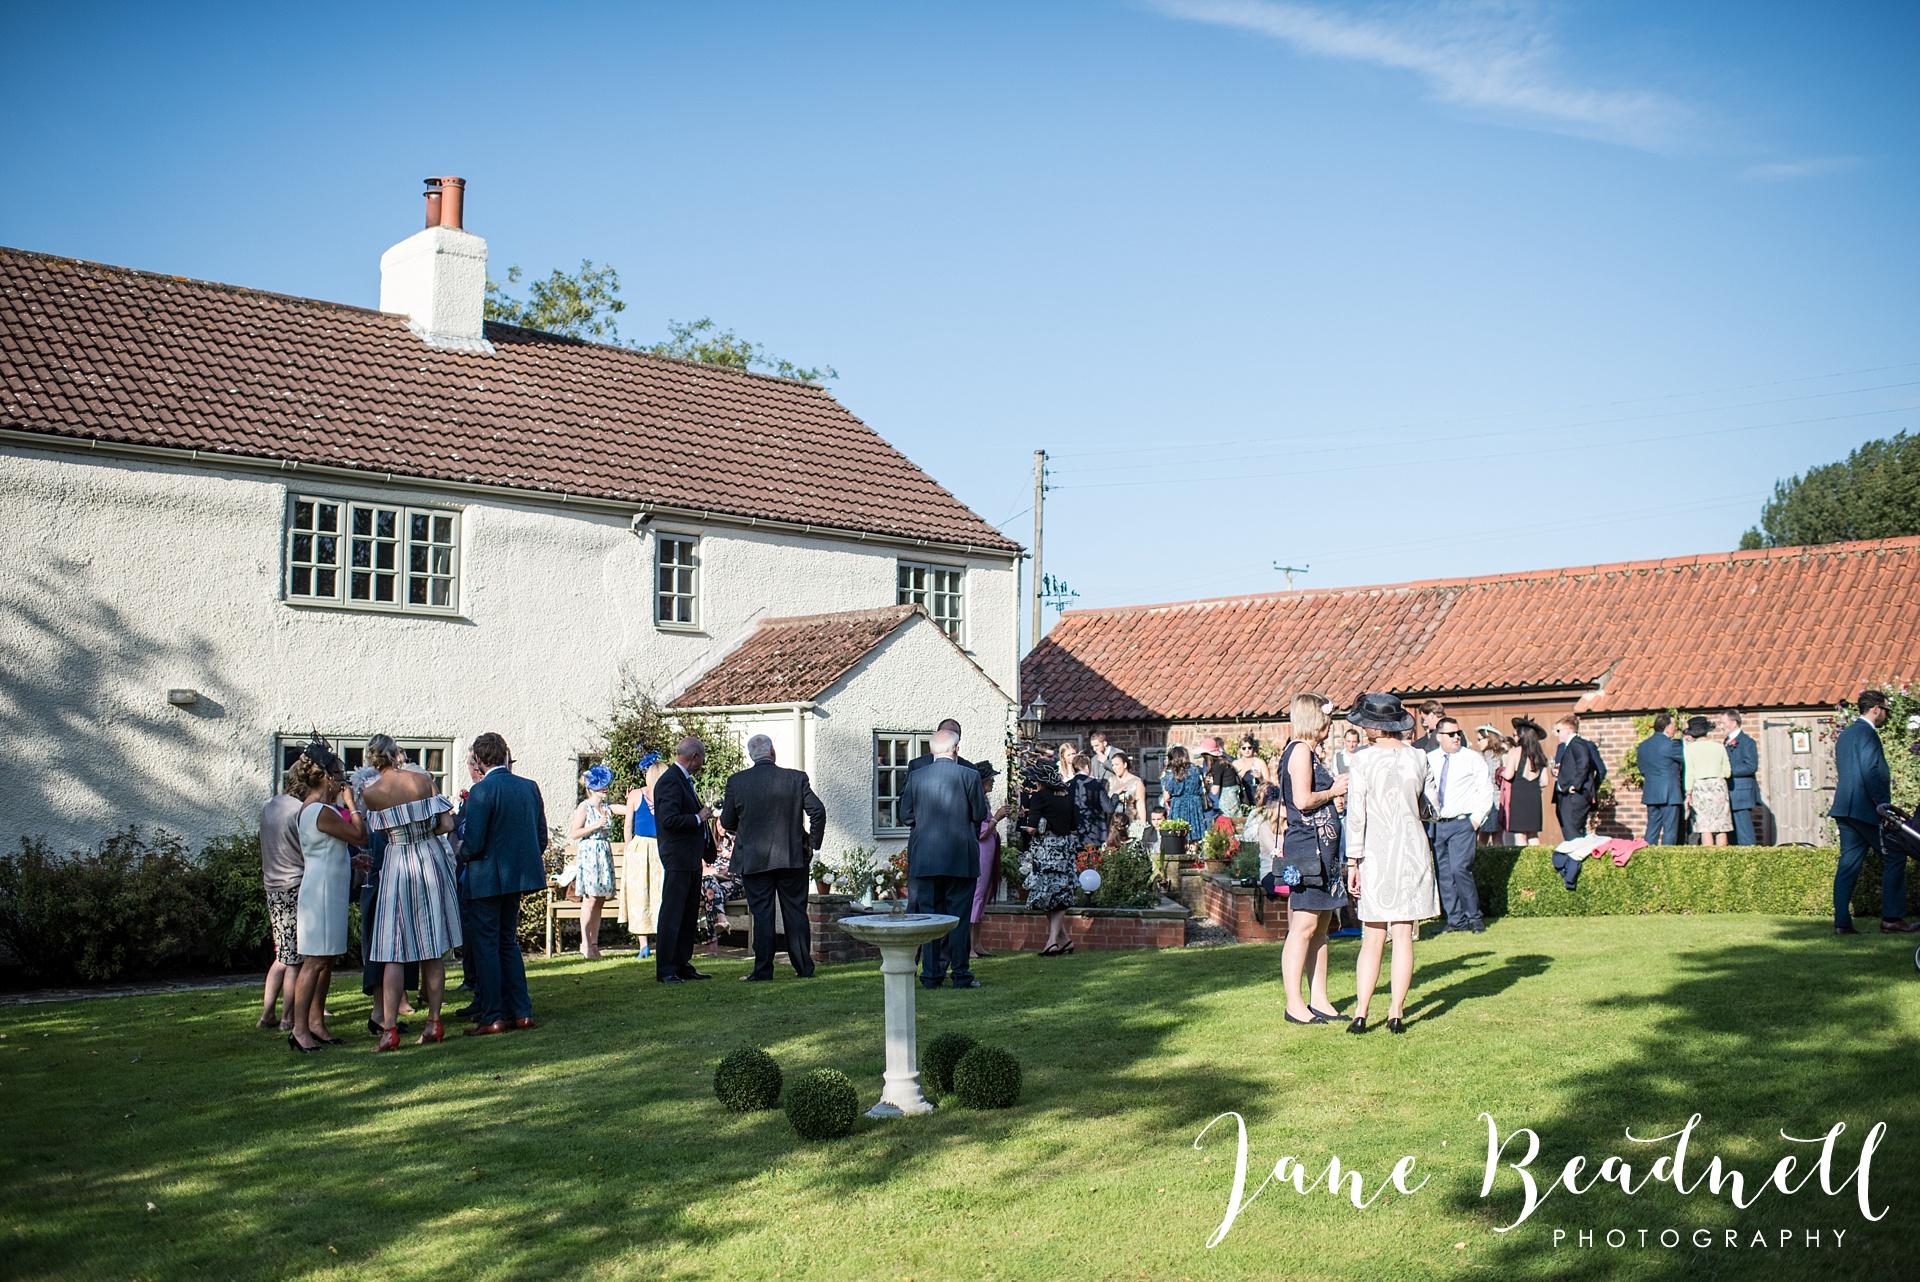 fine-art-wedding-photographer-jane-beadnell-yorkshire-wedding-photographer-garden-wedding_0085